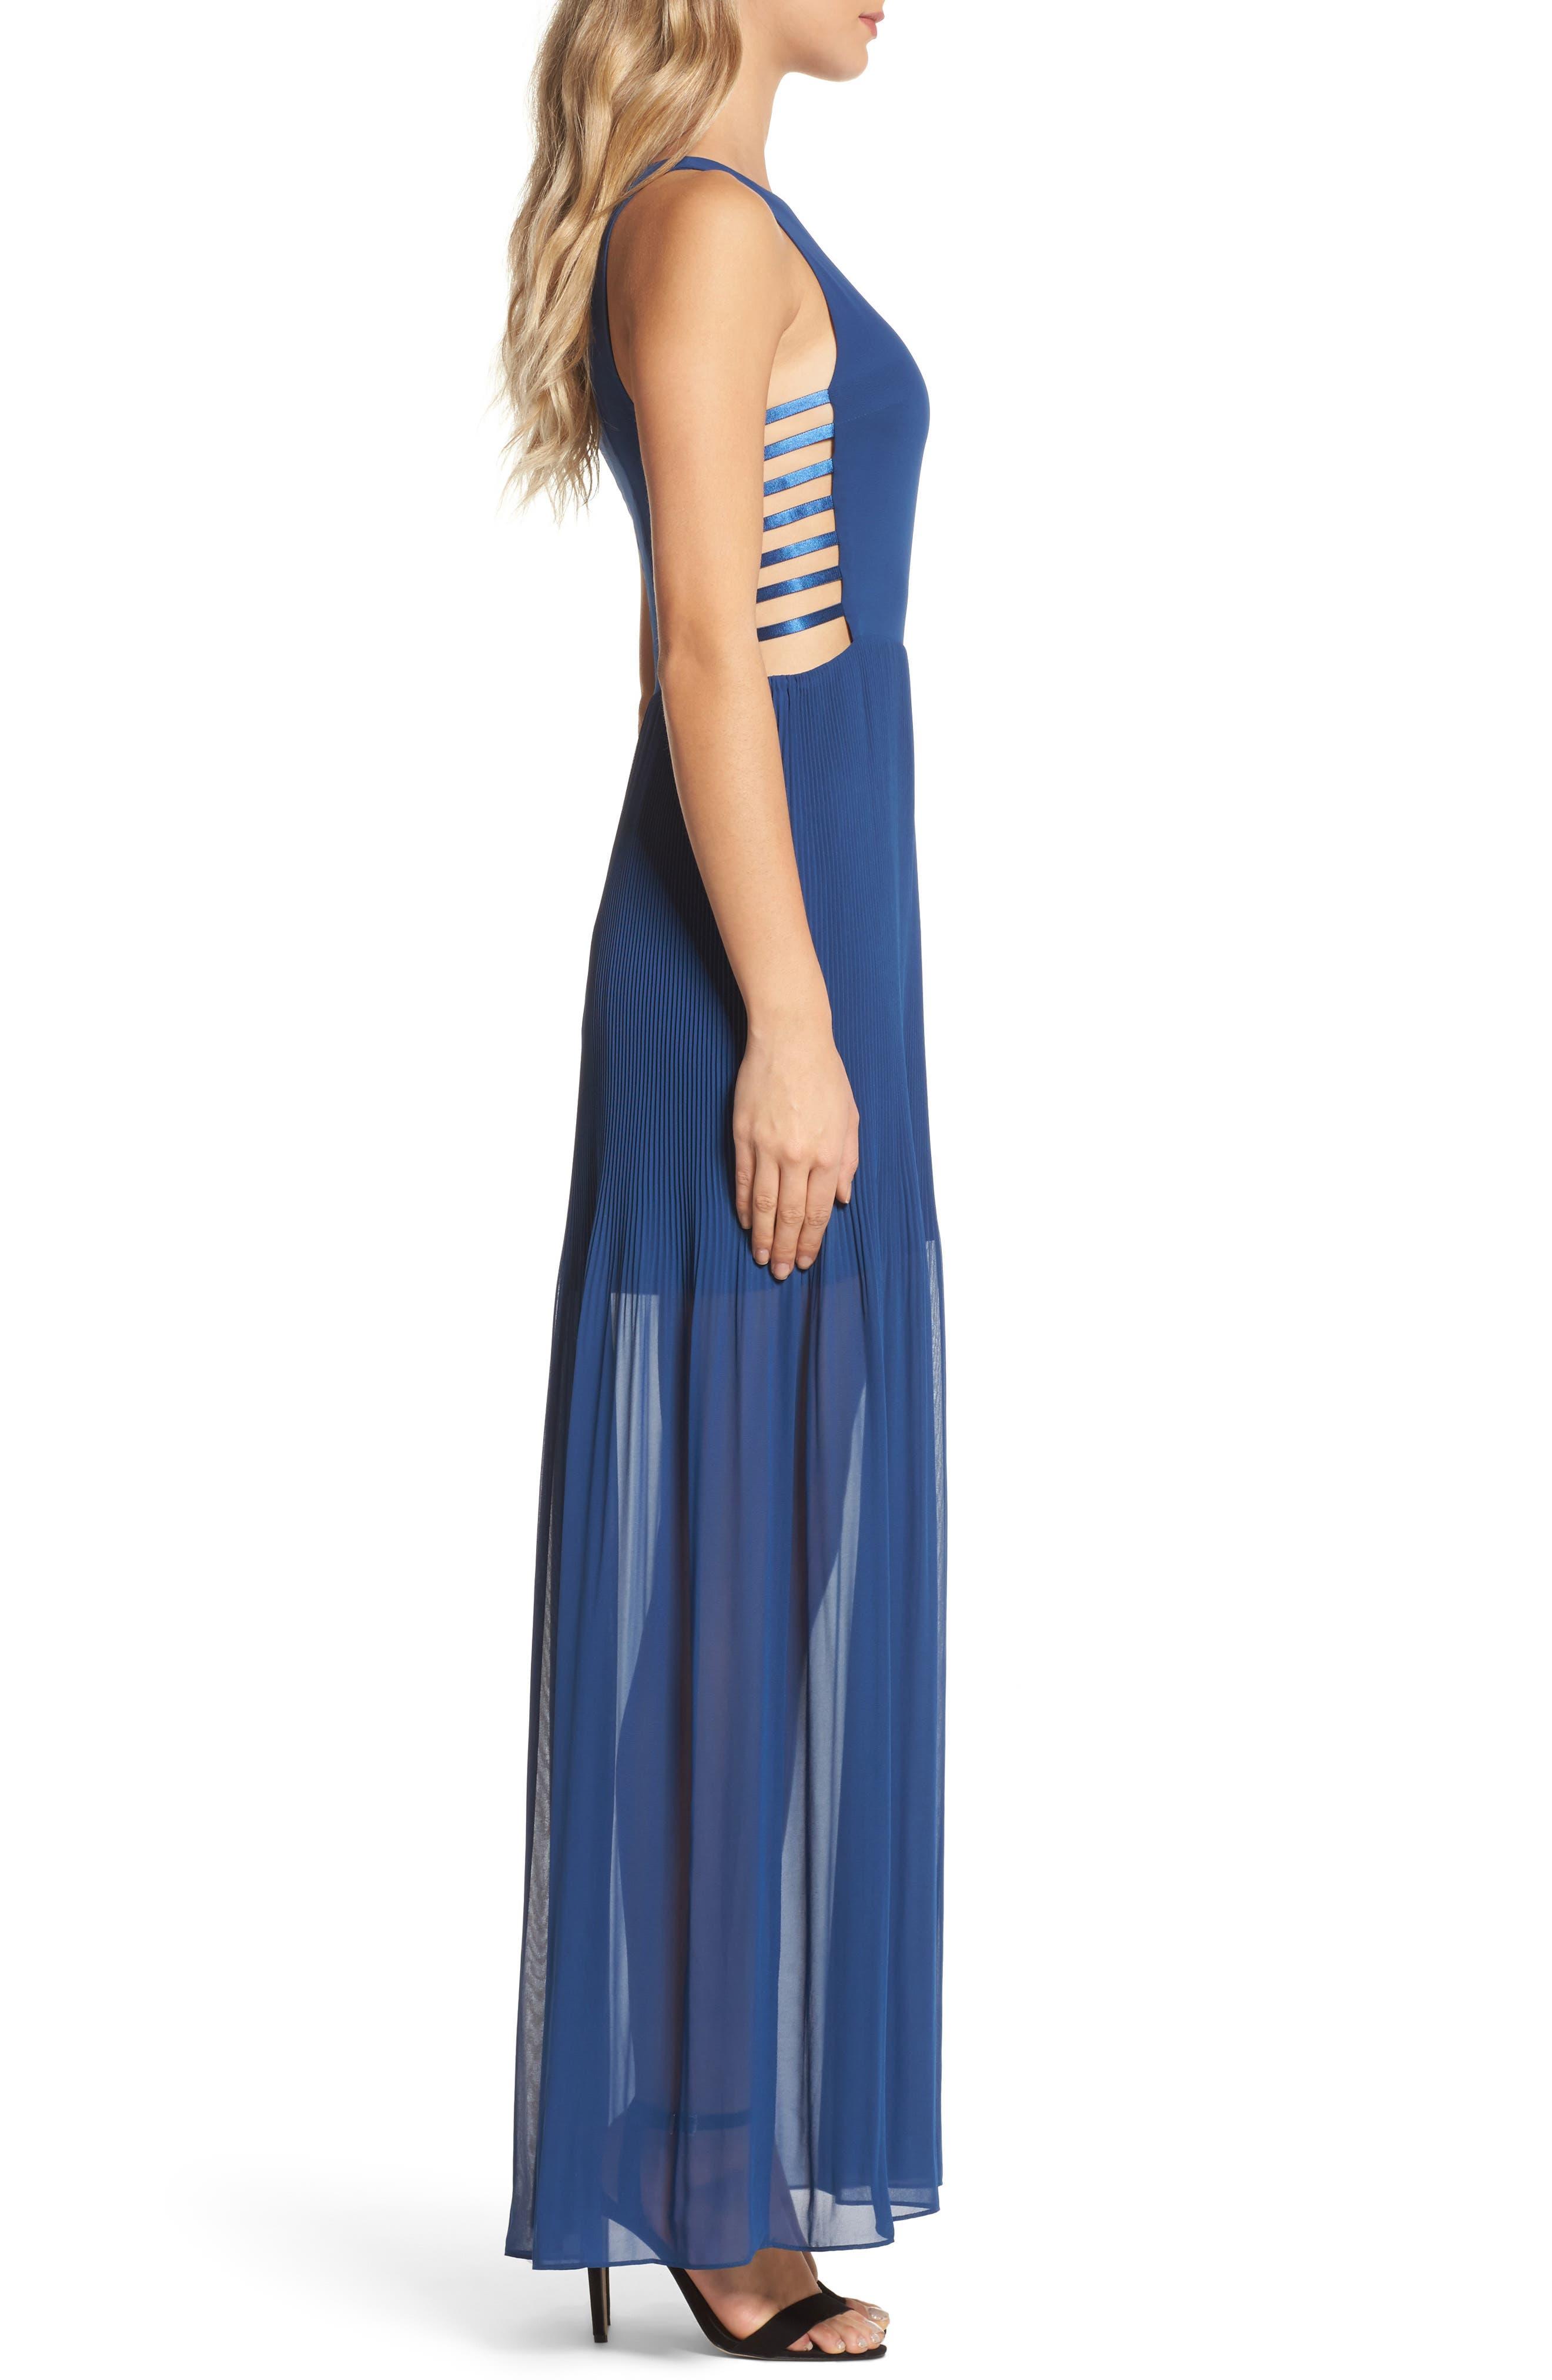 Sunset Blvd Maxi Dress,                             Alternate thumbnail 4, color,                             French Blue